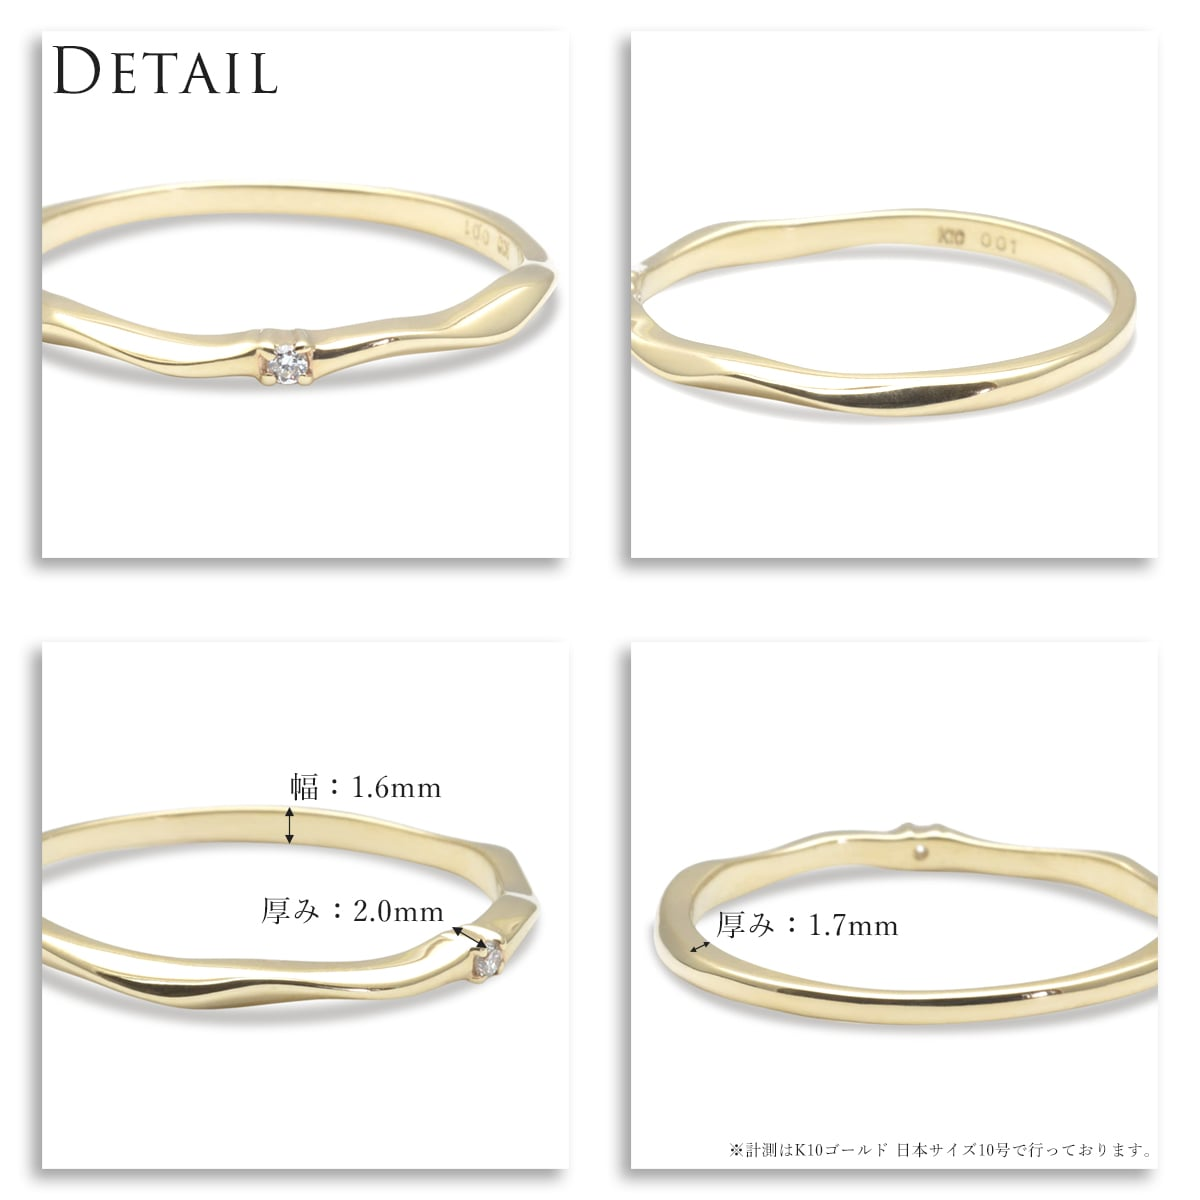 K10 リング 指輪 ダイヤモンド ウェイビーゴールドリング (RERALUy) 華奢 新作/rri1677k10